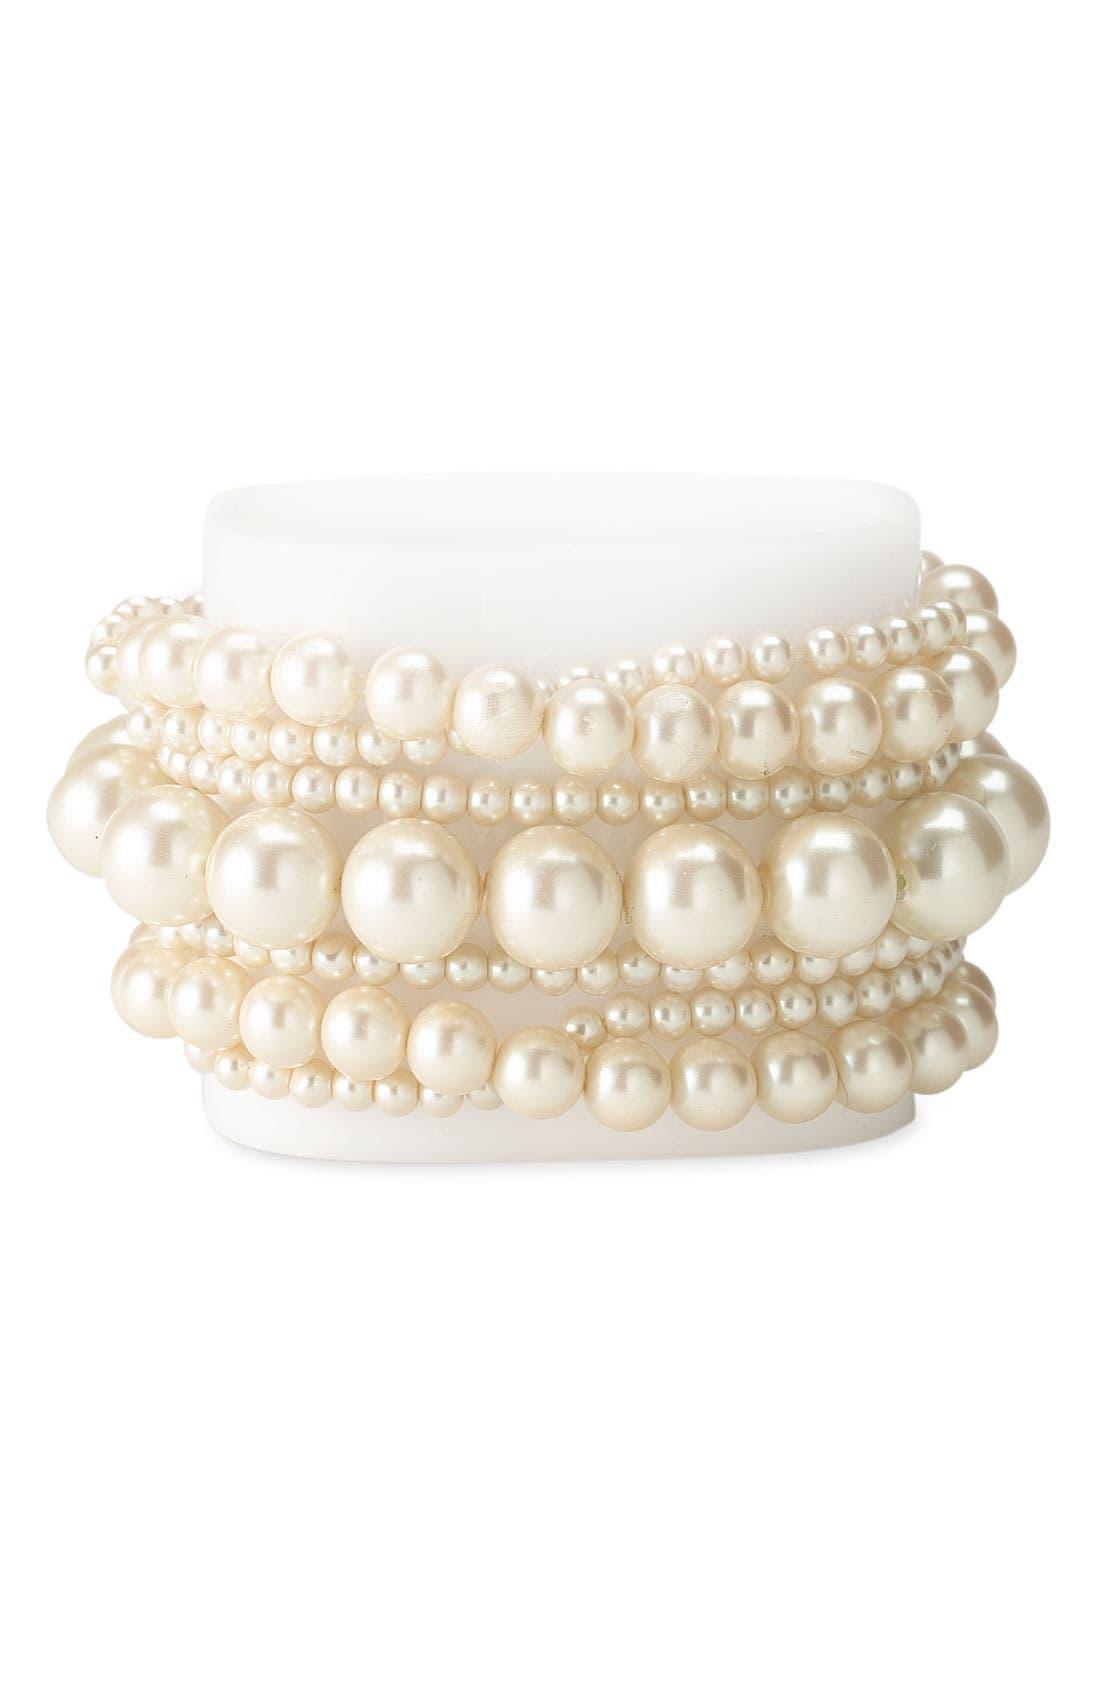 Main Image - Nordstrom Glass Stretch Pearl Bracelet